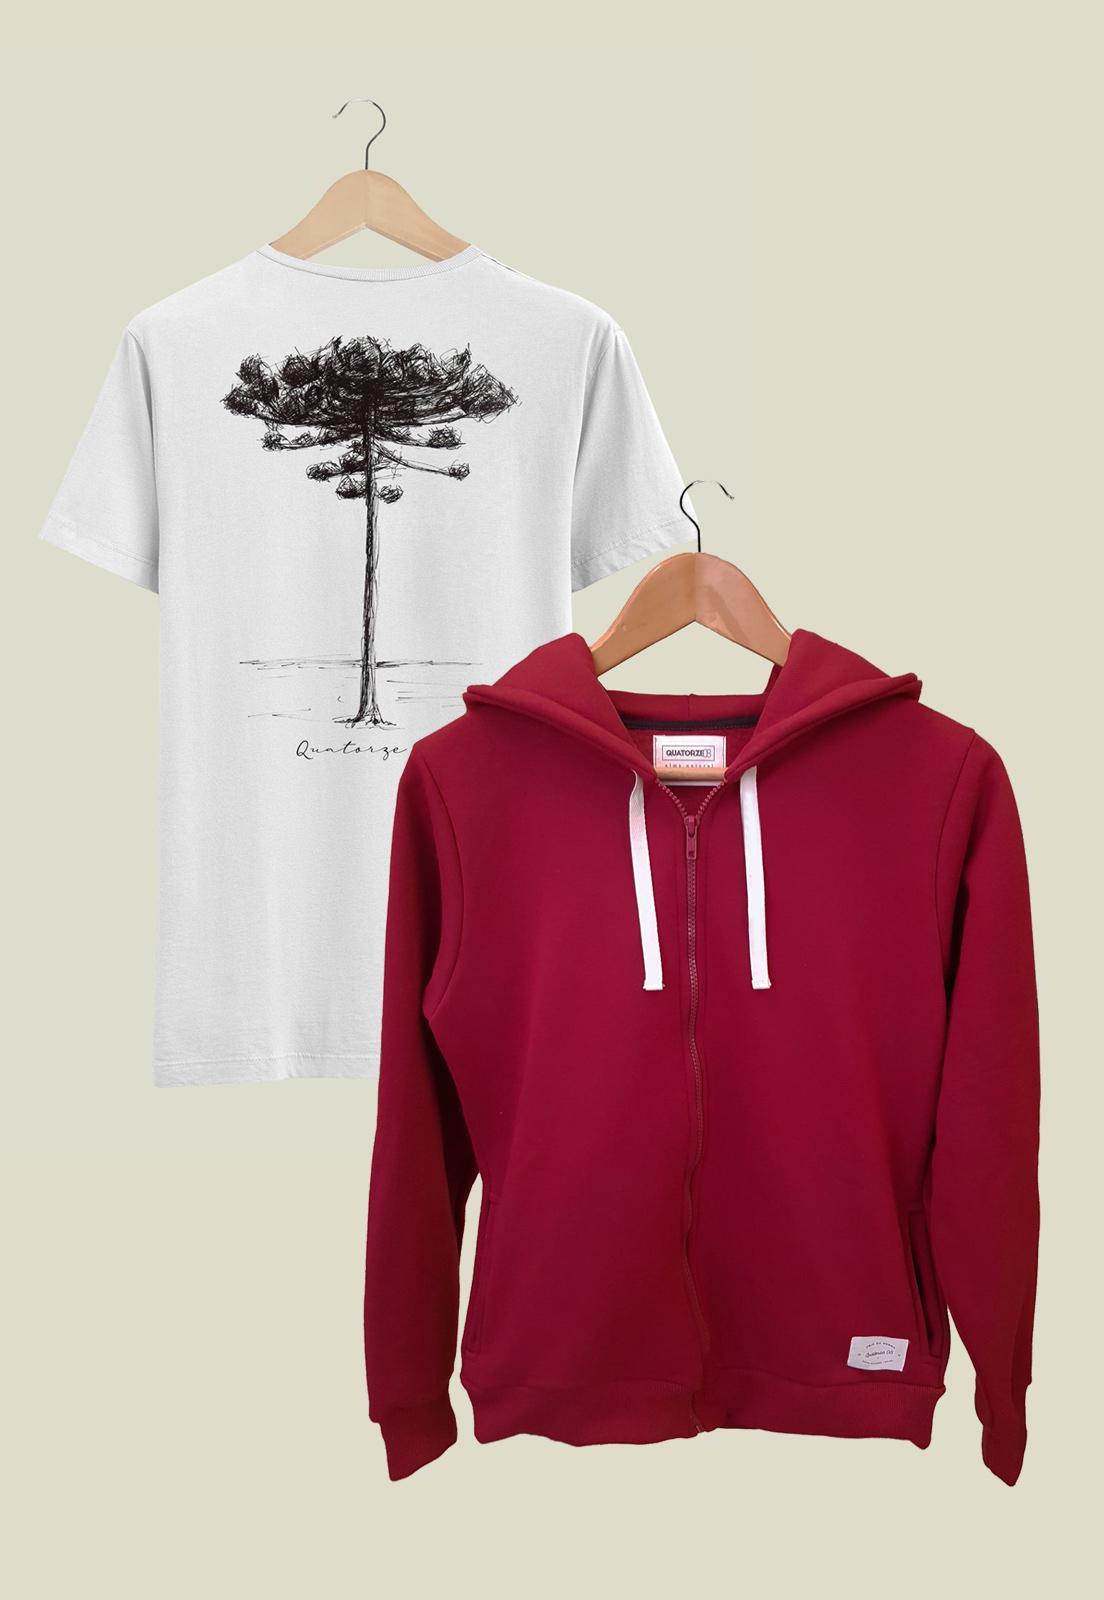 Caixa Presente Masculino Jaqueta Bordô + Camiseta Araucária Off-White